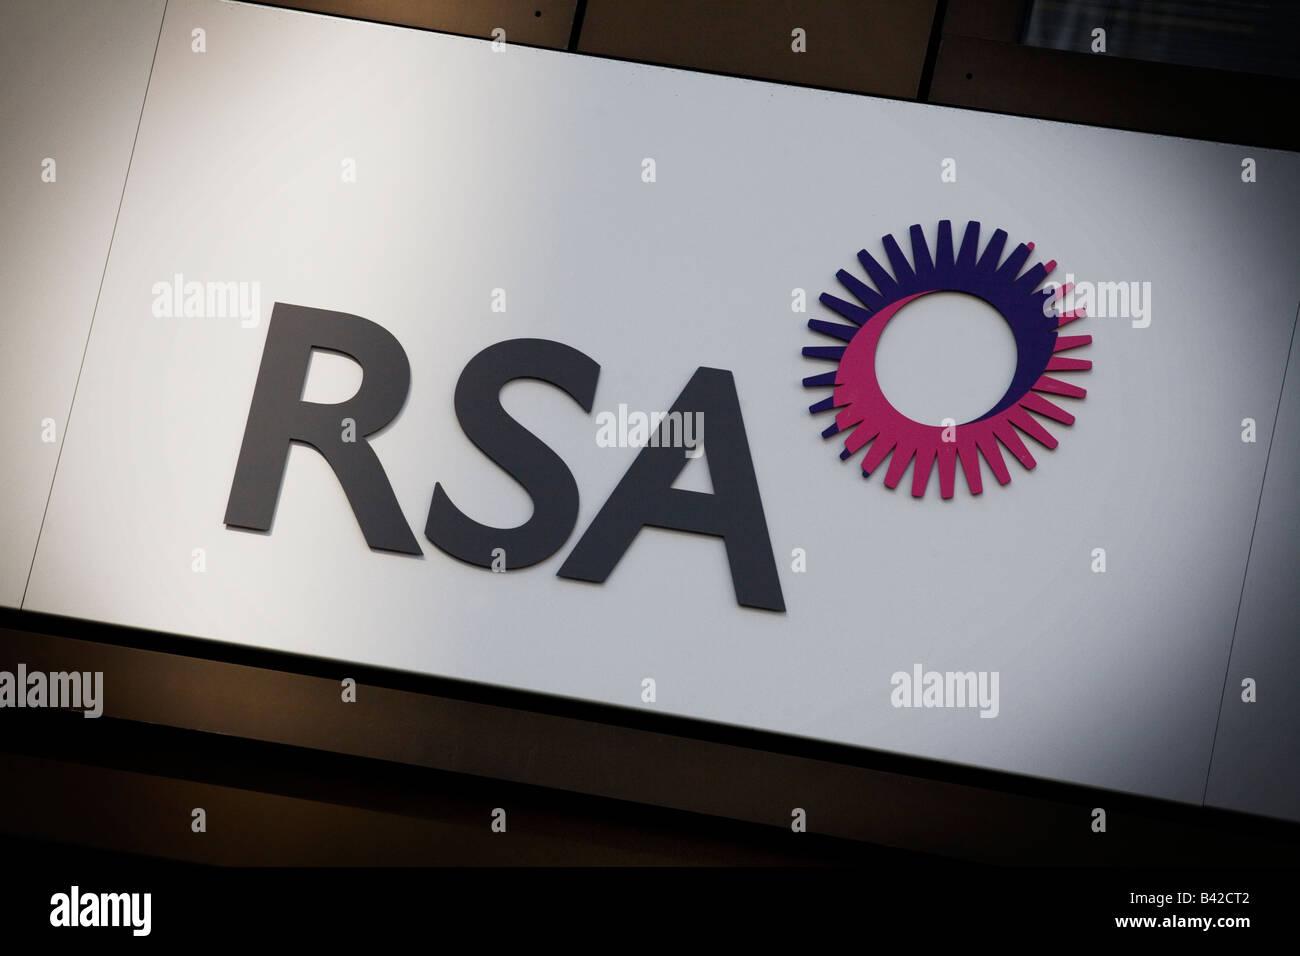 RSA insurance group logo outside London headquarters - Stock Image